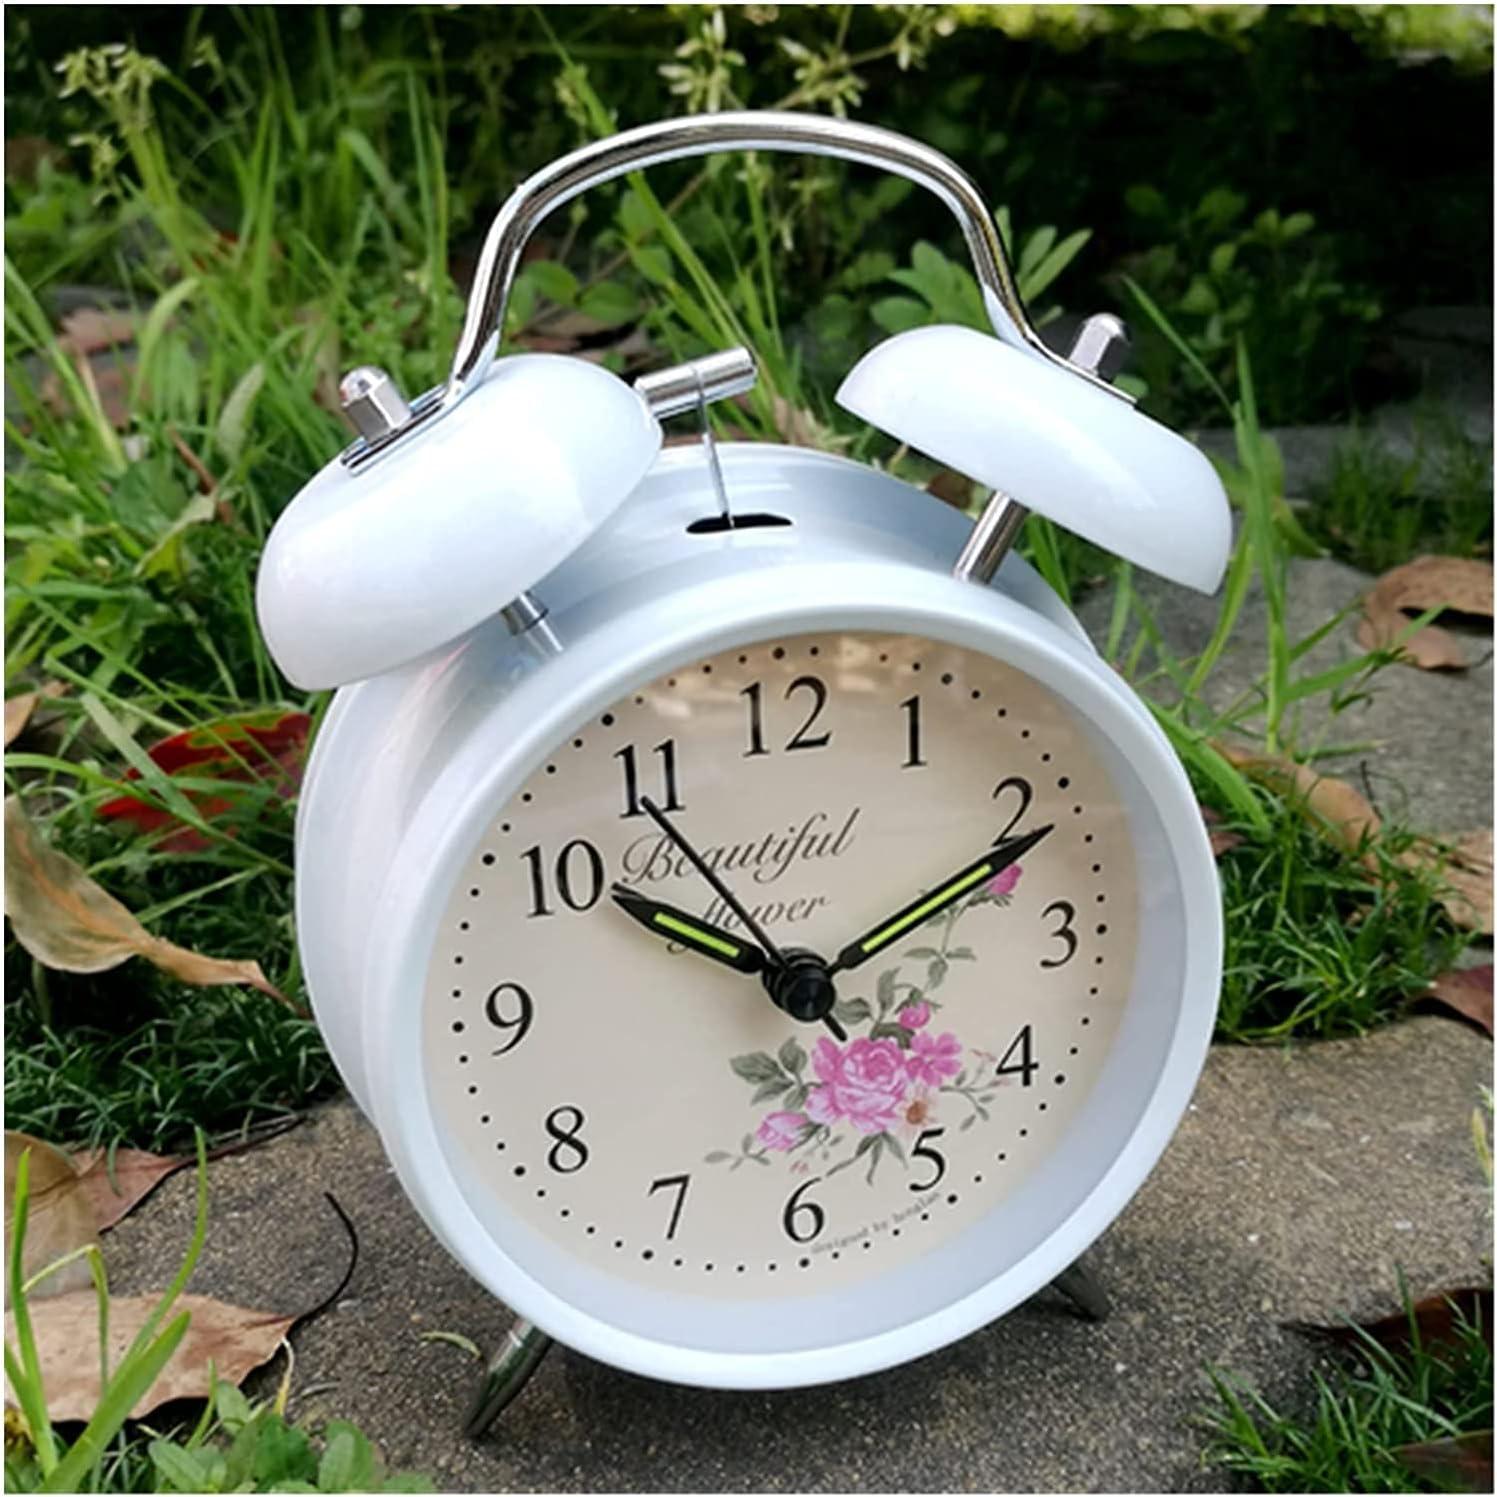 New Orleans Mall Tophacker Alarm favorite Clock Metal Table Bedsi Bell Bedroom